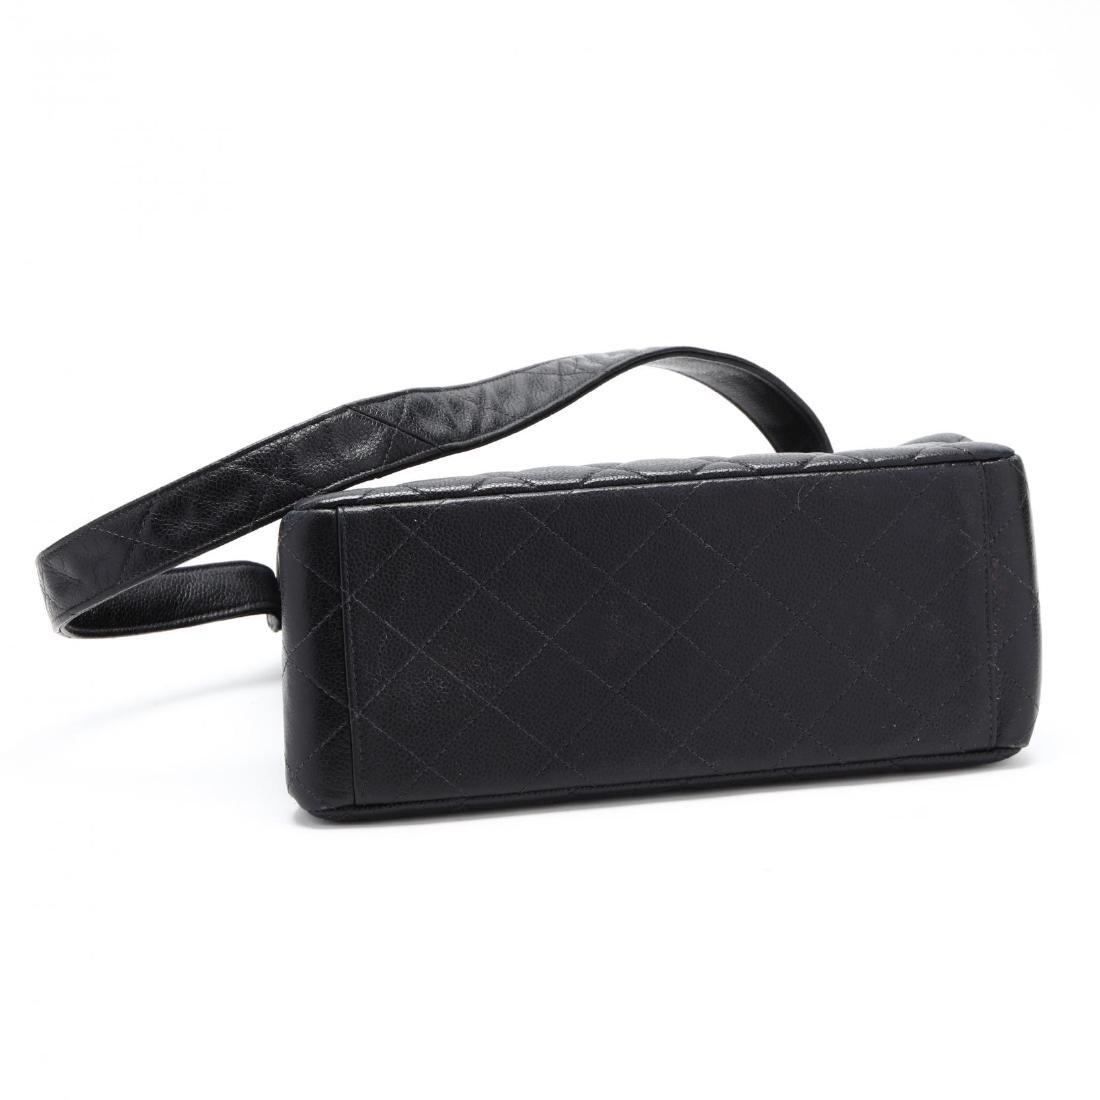 Caviar Leather Trapeze Flap Handbag, Chanel - 7